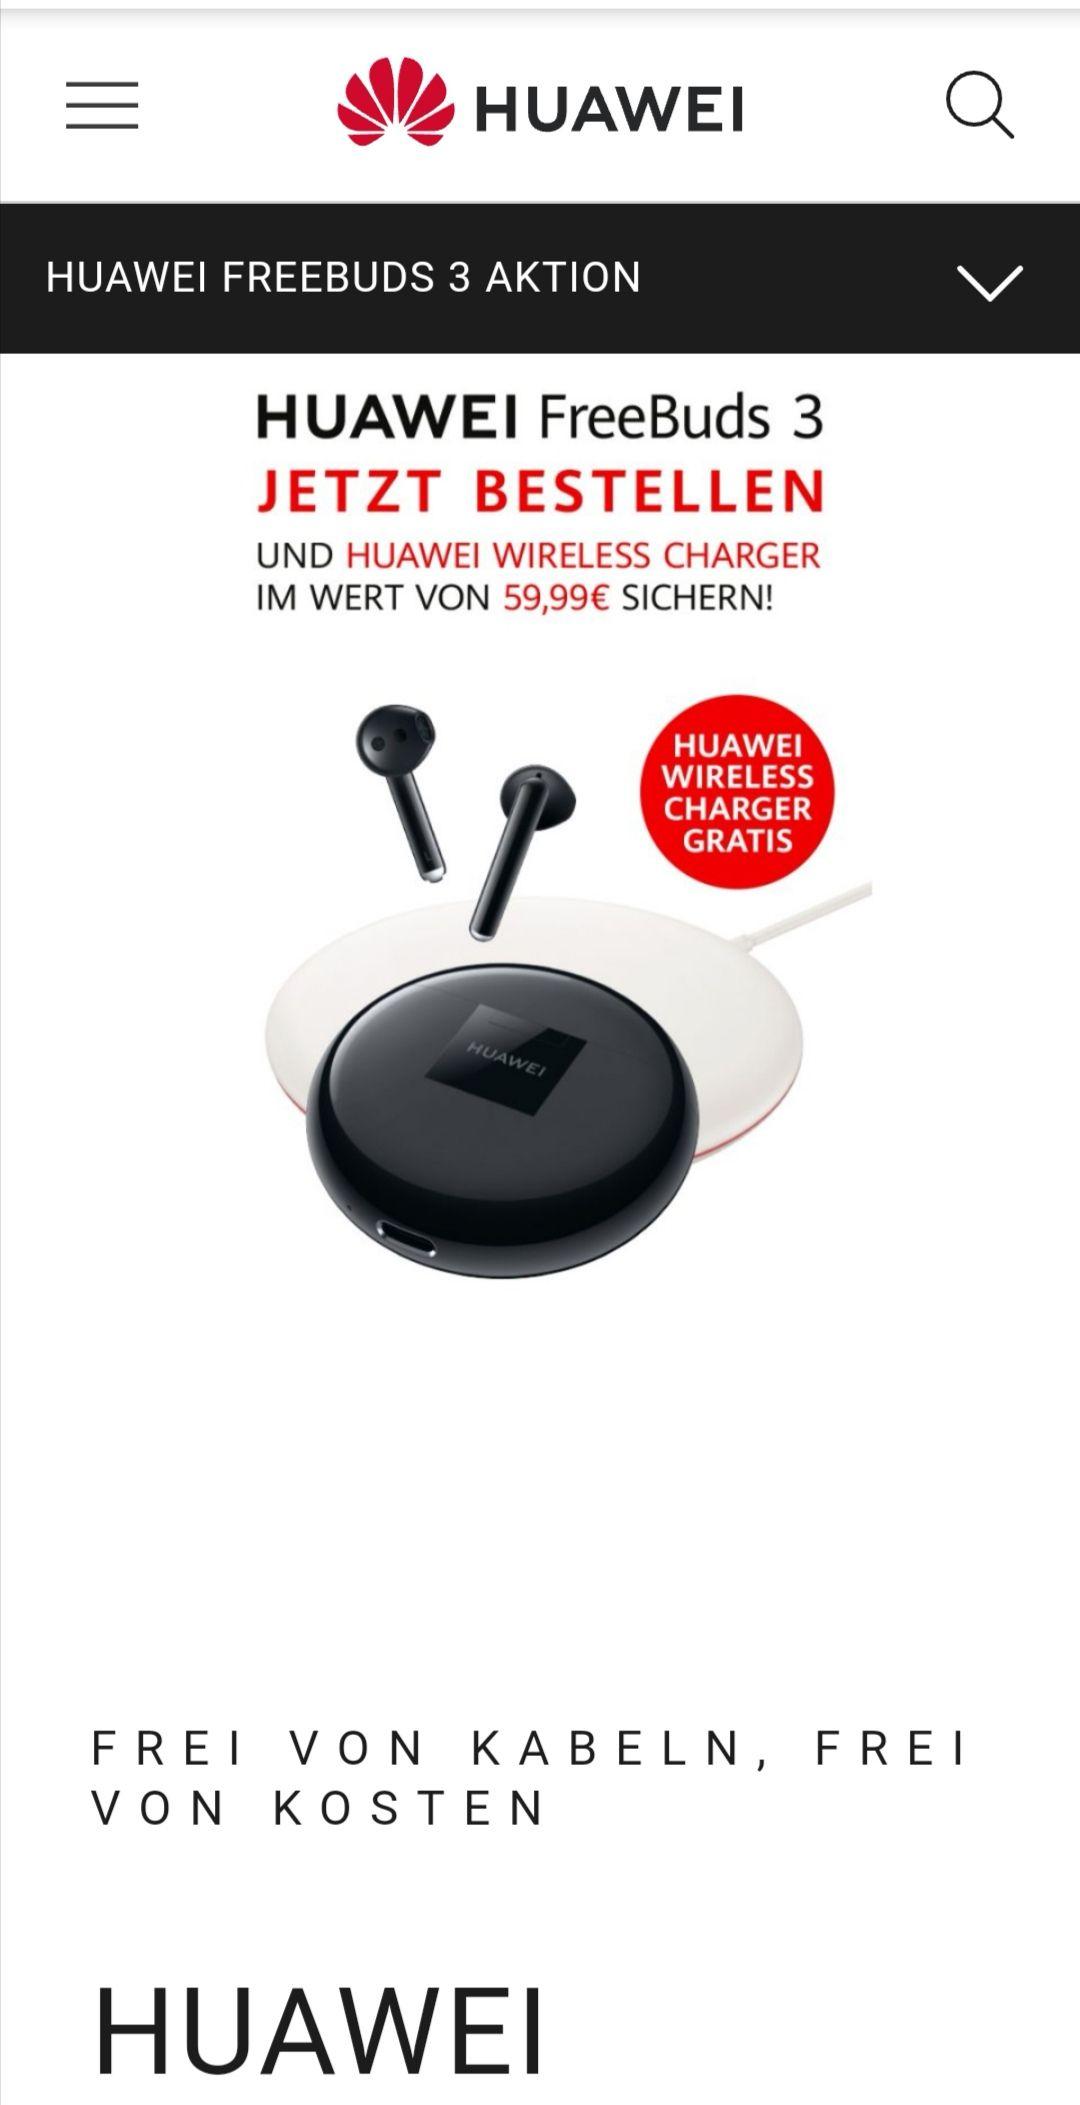 Huawei Freebuds 3 + Wireless charger